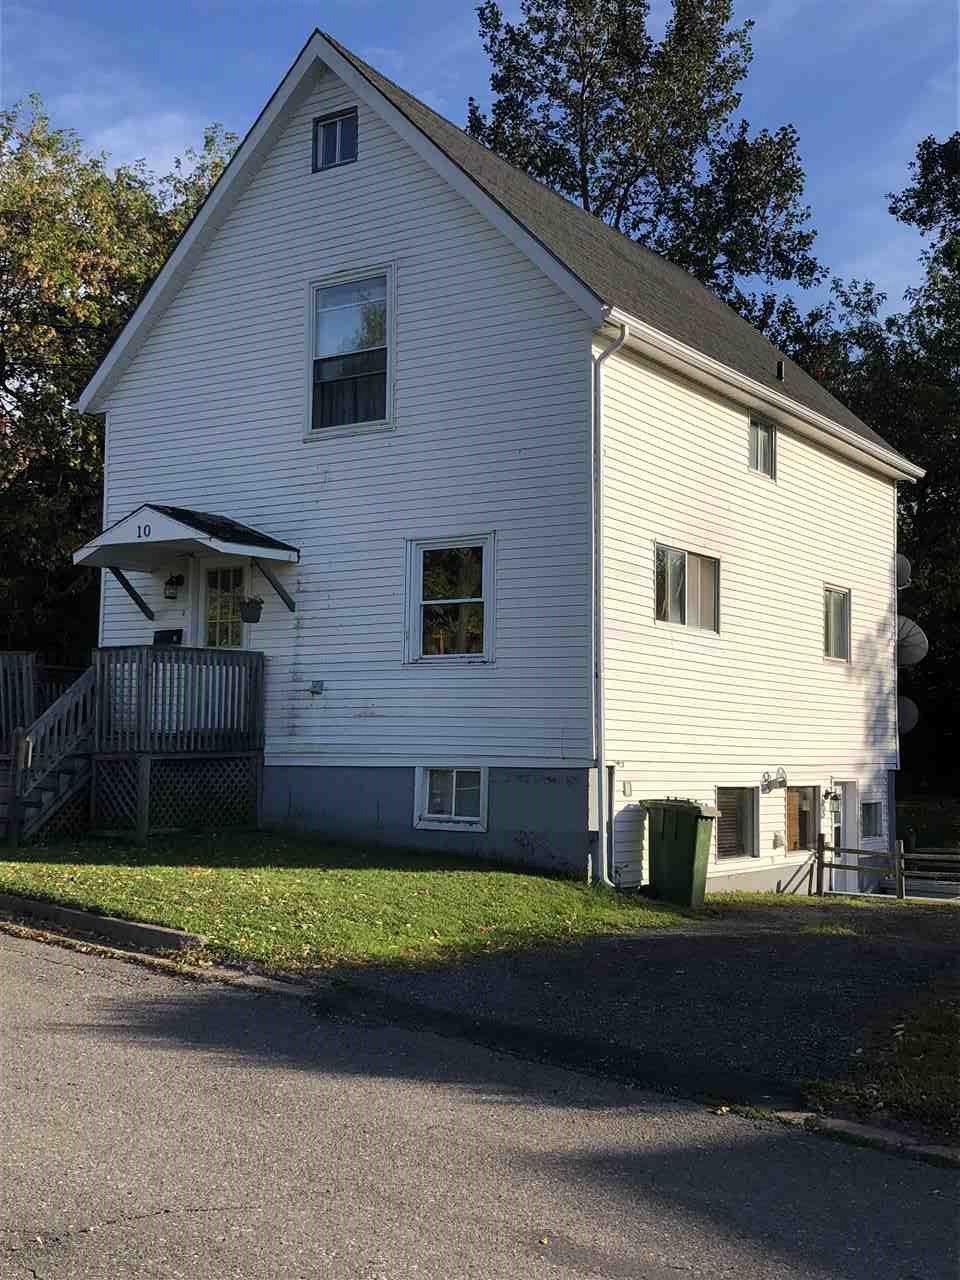 Main Photo: 10 Porters Lane in Trenton: 107-Trenton,Westville,Pictou Multi-Family for sale (Northern Region)  : MLS®# 202024218